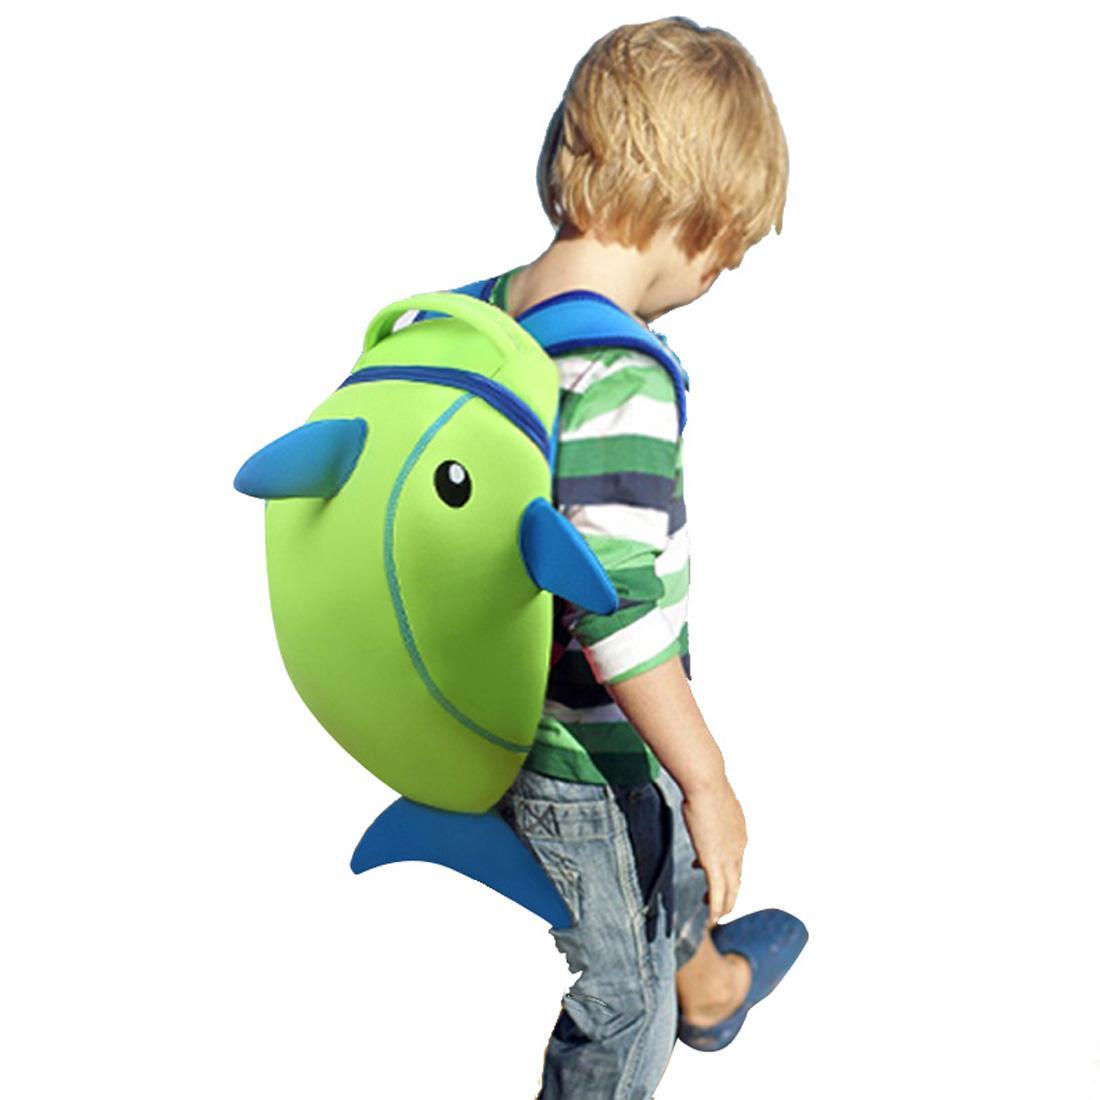 e4ca7782f542 Waterproof School Bags NOHOO Mochila Neopreno Kids Backpack Cartoon Animal Children  School Bags For Girls Boys Toddler Baby Bag Preschool Backpacks ...